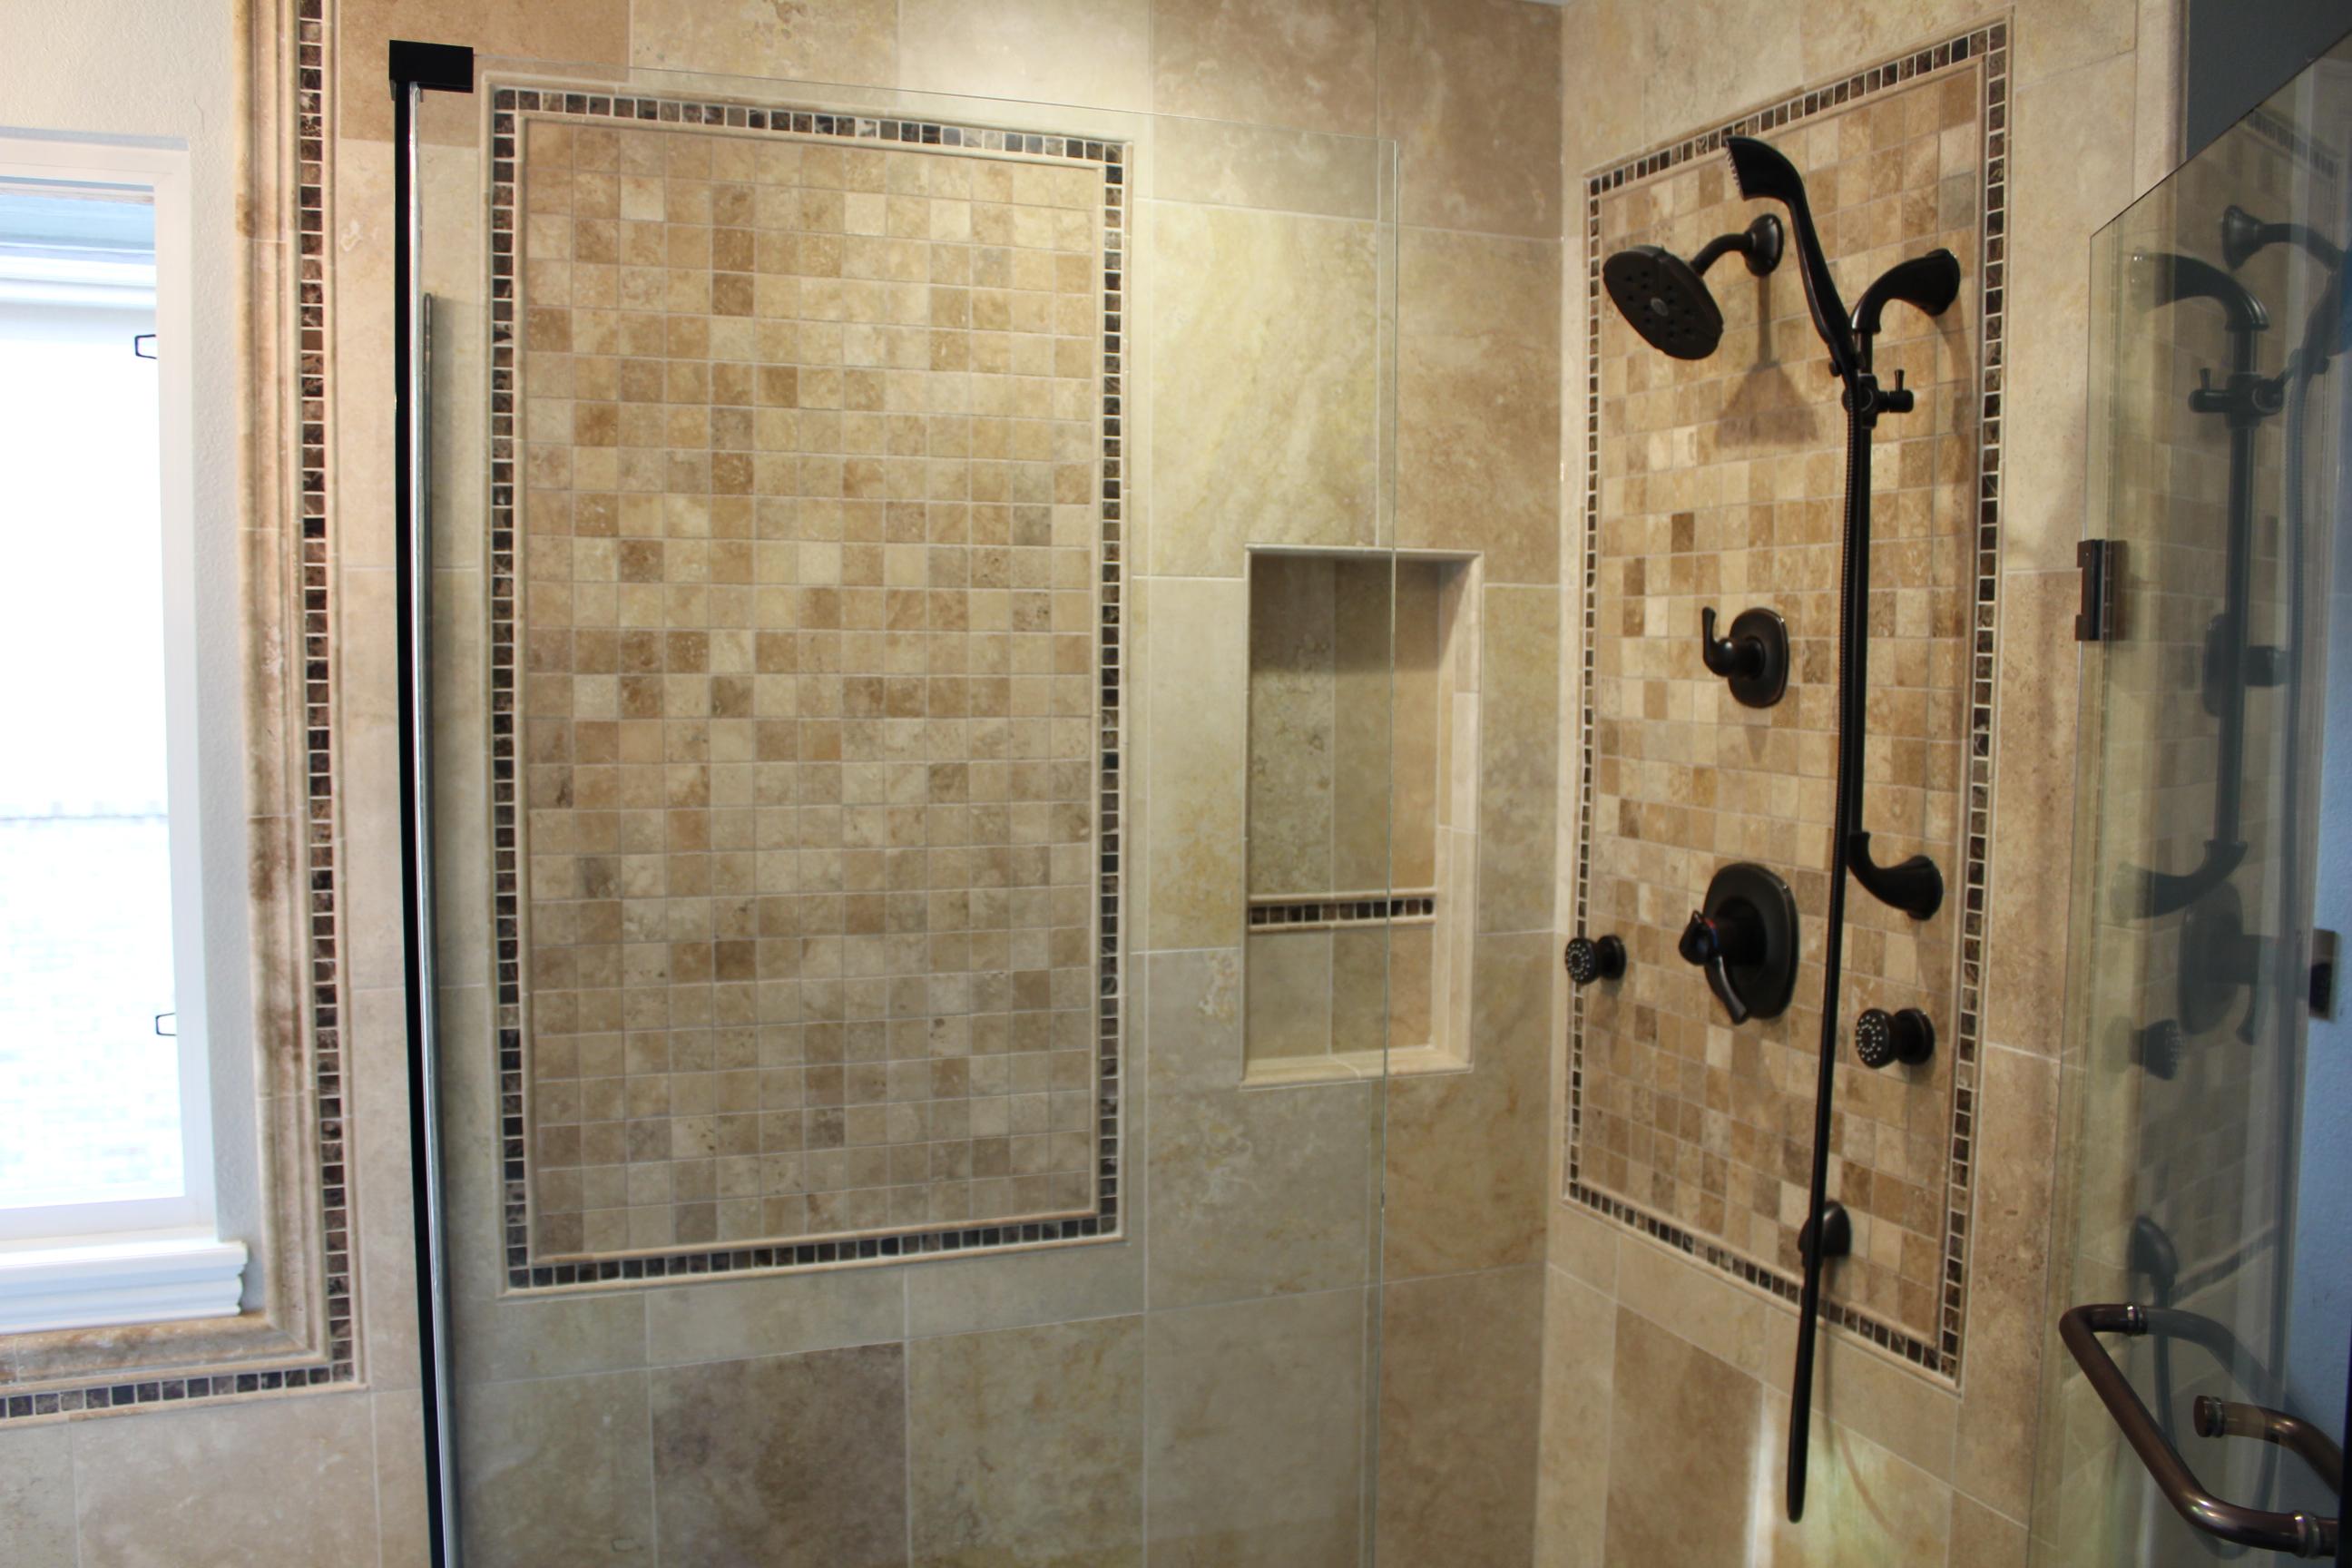 new bathroom oi or master graphics design elegant bathrooms